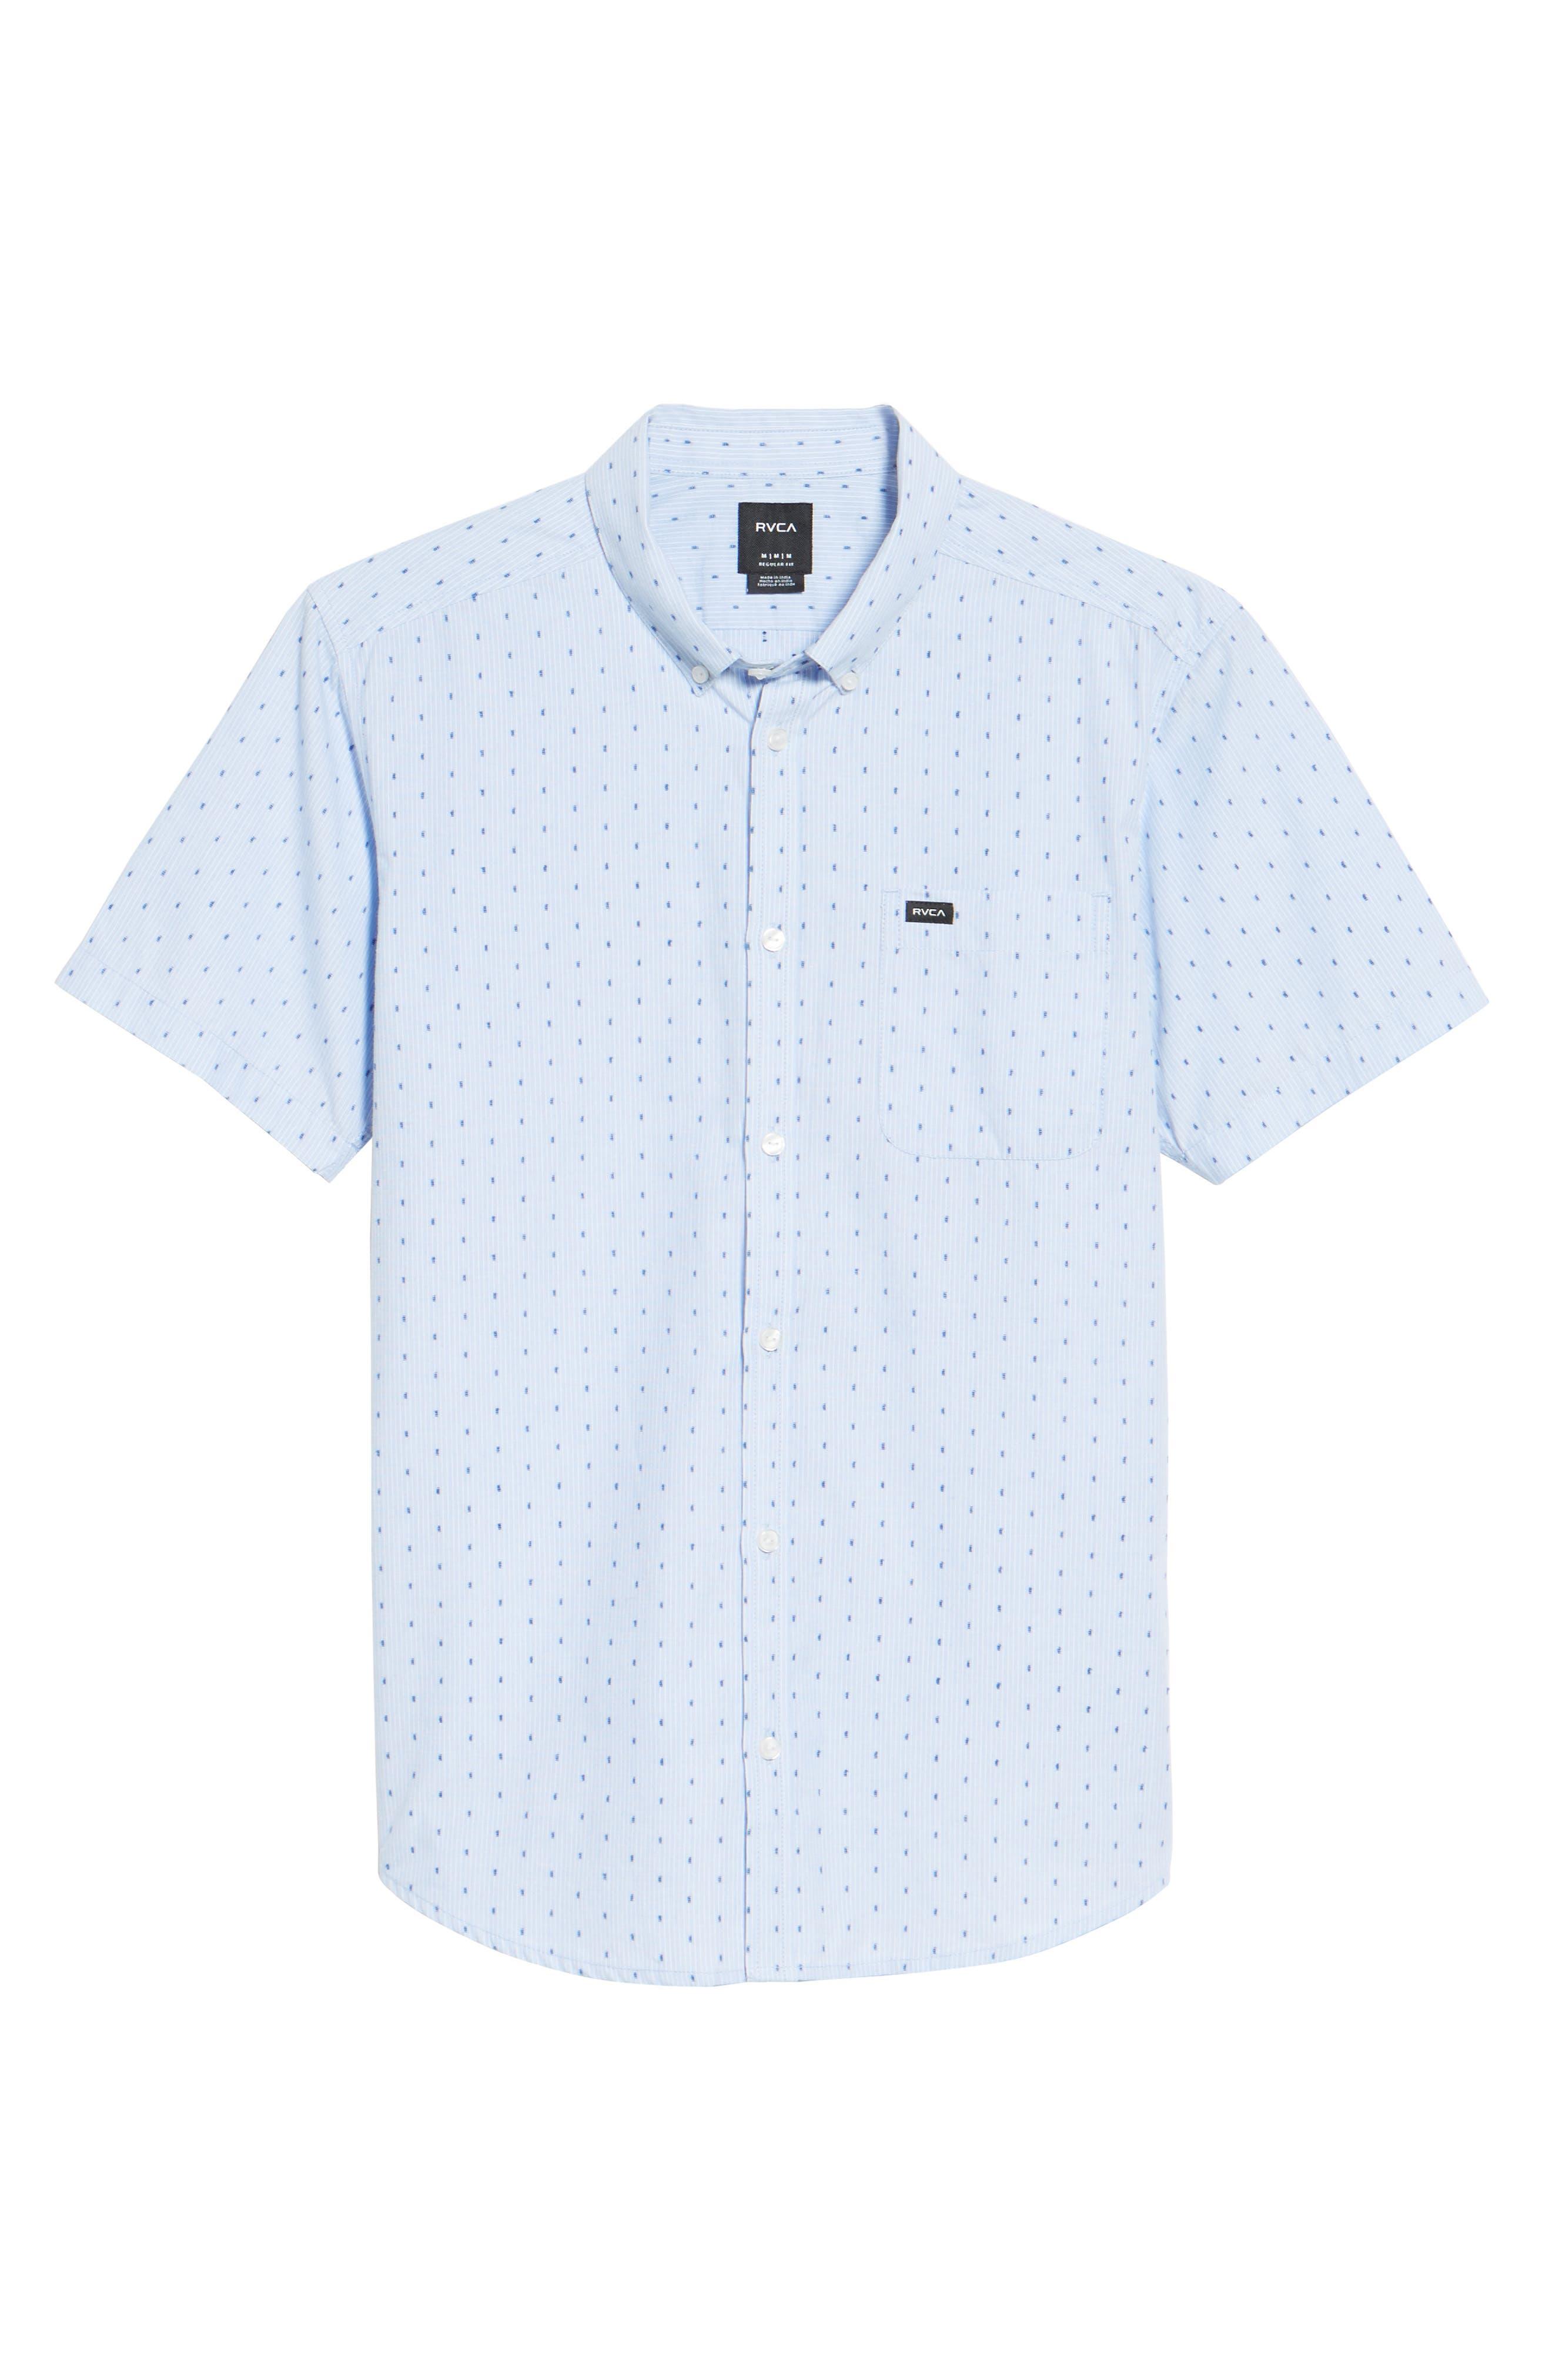 Return Dobby Woven Shirt,                             Main thumbnail 1, color,                             Antique White